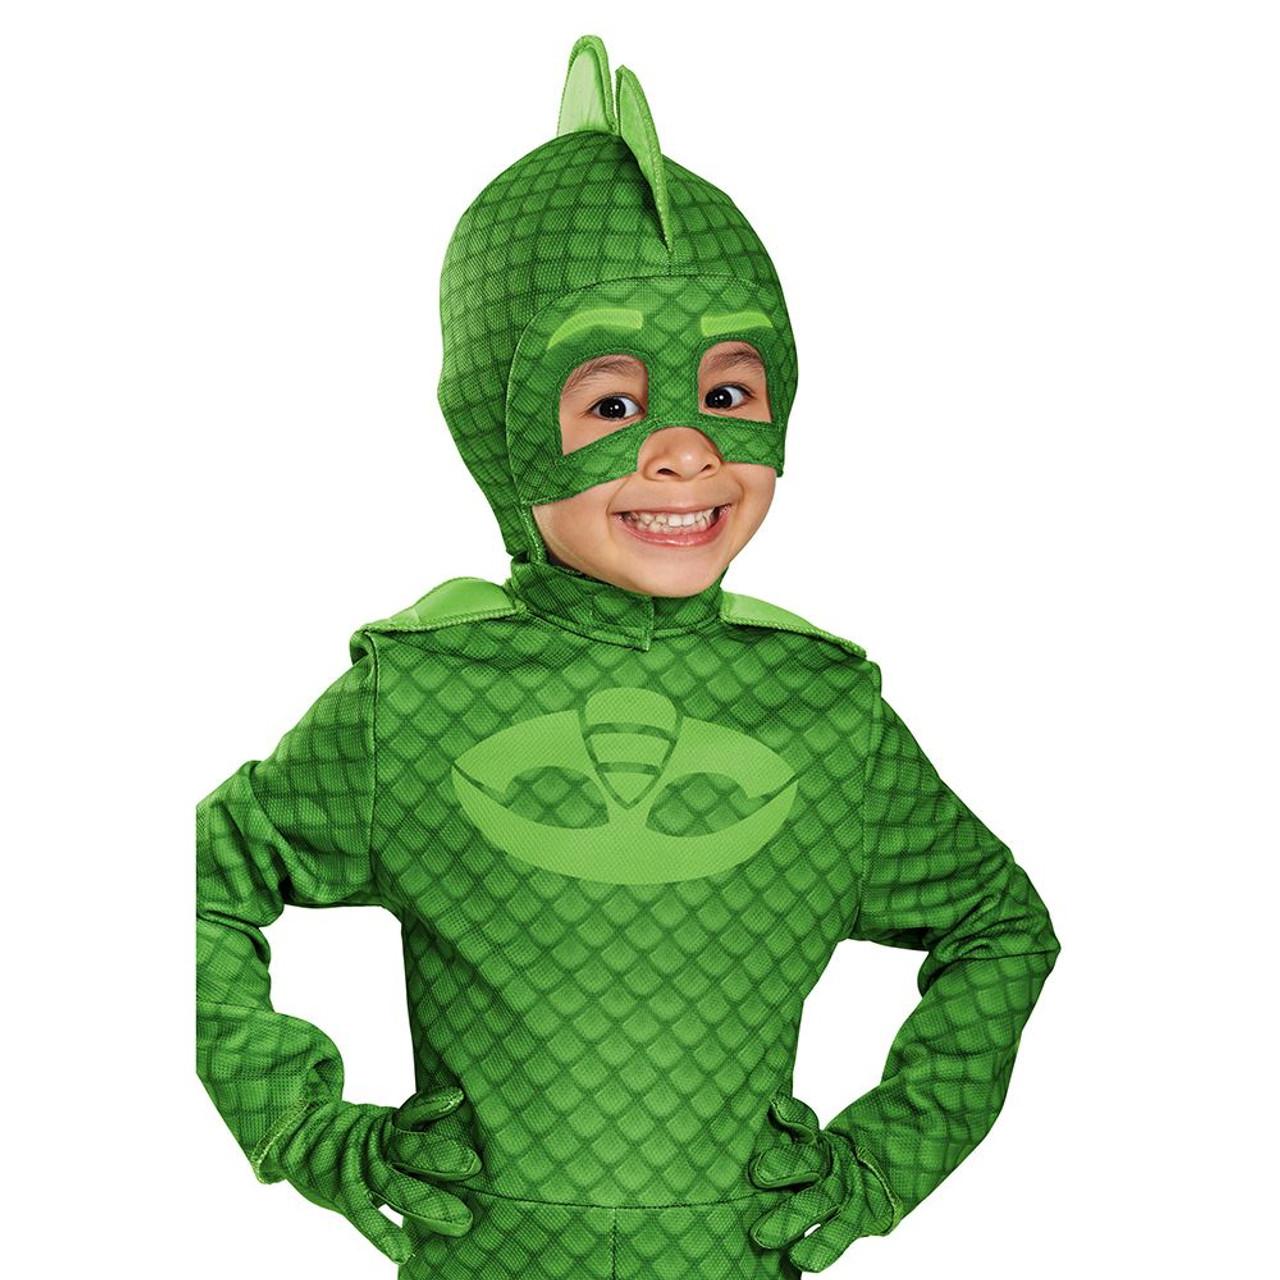 Pj Masks Halloween Costume.Gekko Deluxe Mask Pj Masks Disney Superhero Kids Boys Halloween Costume Mask